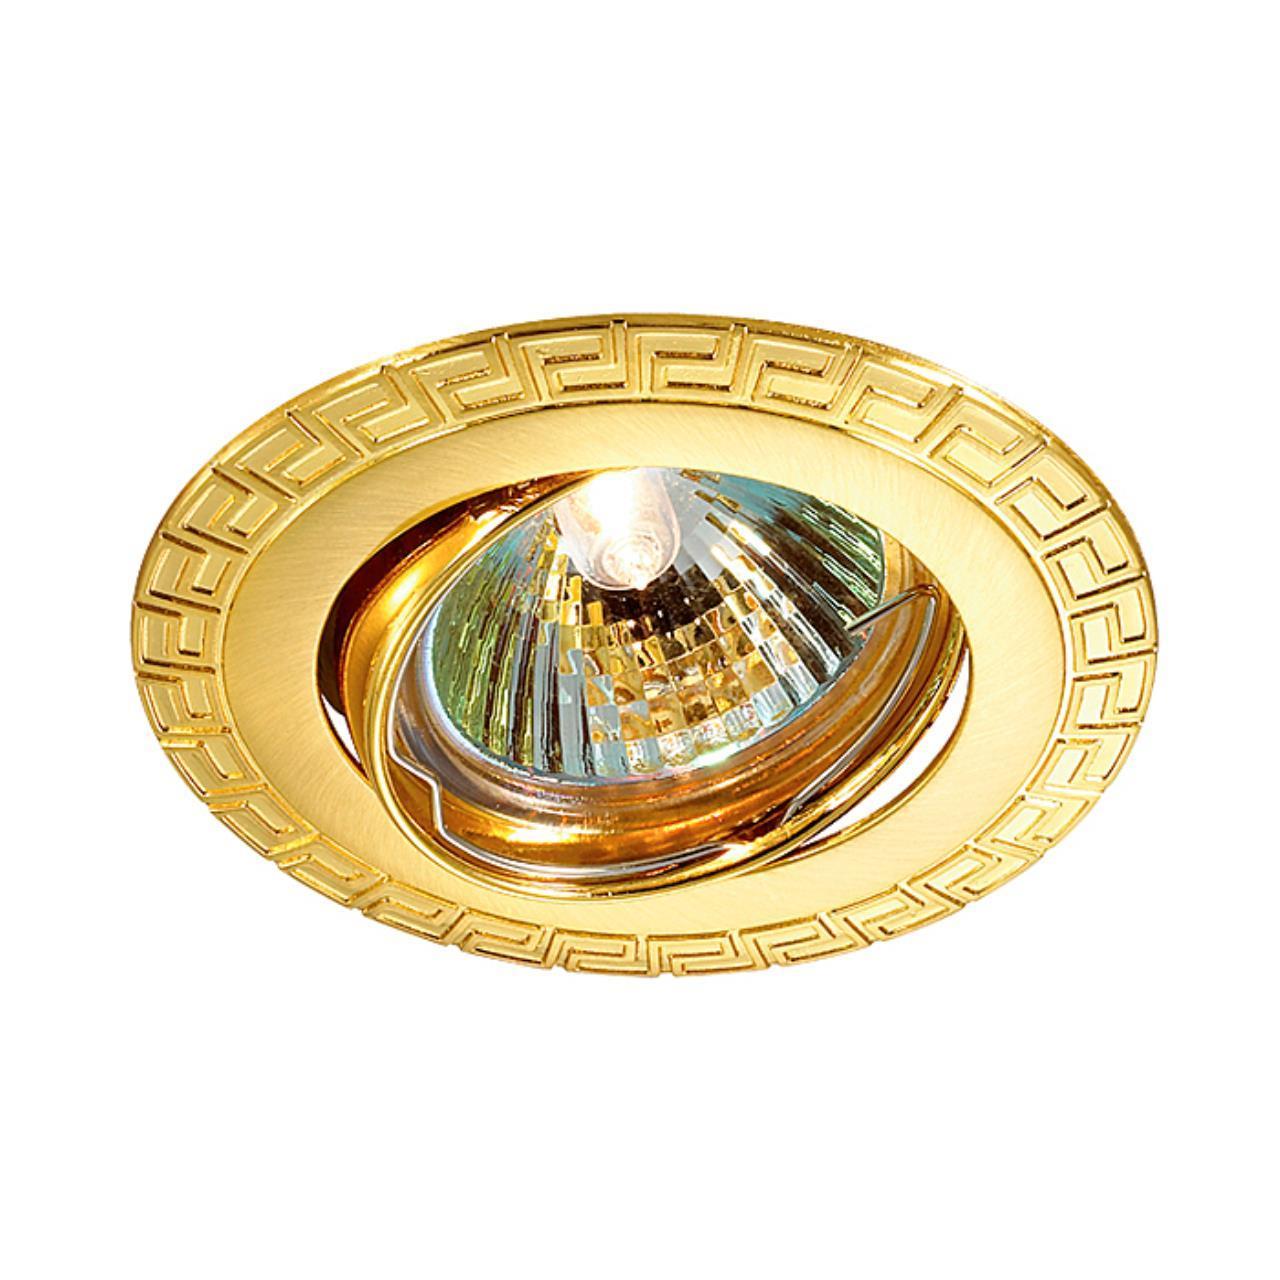 369619 SPOT NT12 136 золото Встраиваемый ПВ светильник IP20 GX5.3 50W 12V COIL